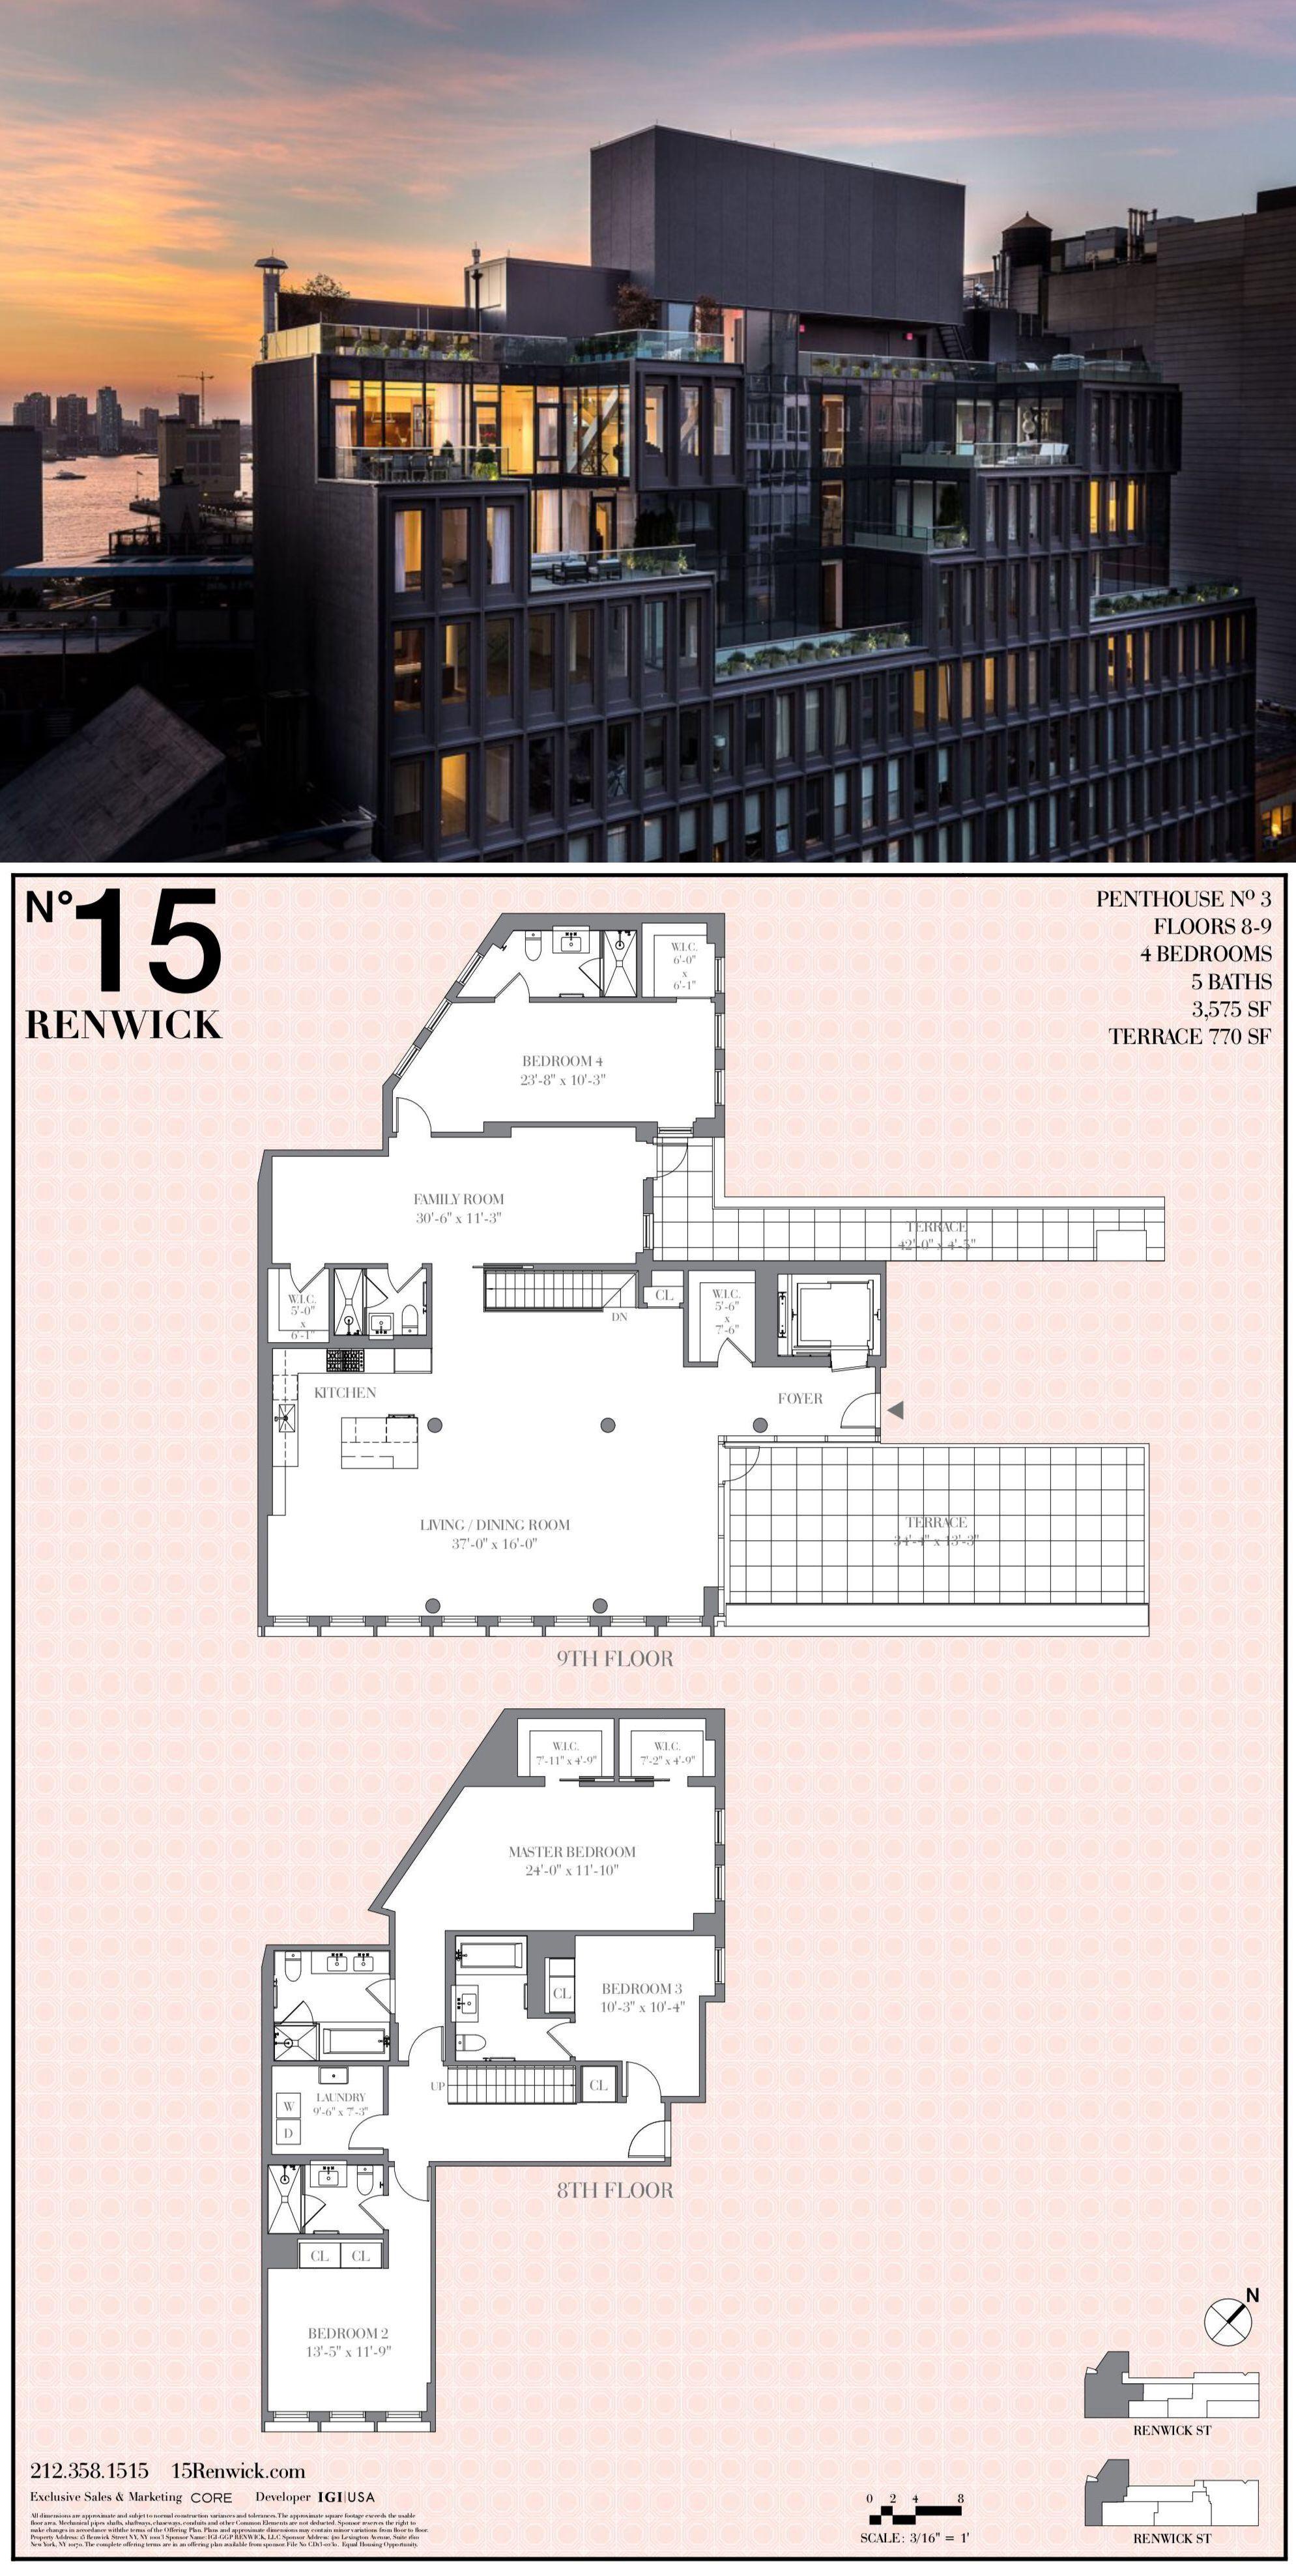 Pin By Stanley On Plans Interessants Penthouse Apartment Floor Plan Pent House Floor Plans